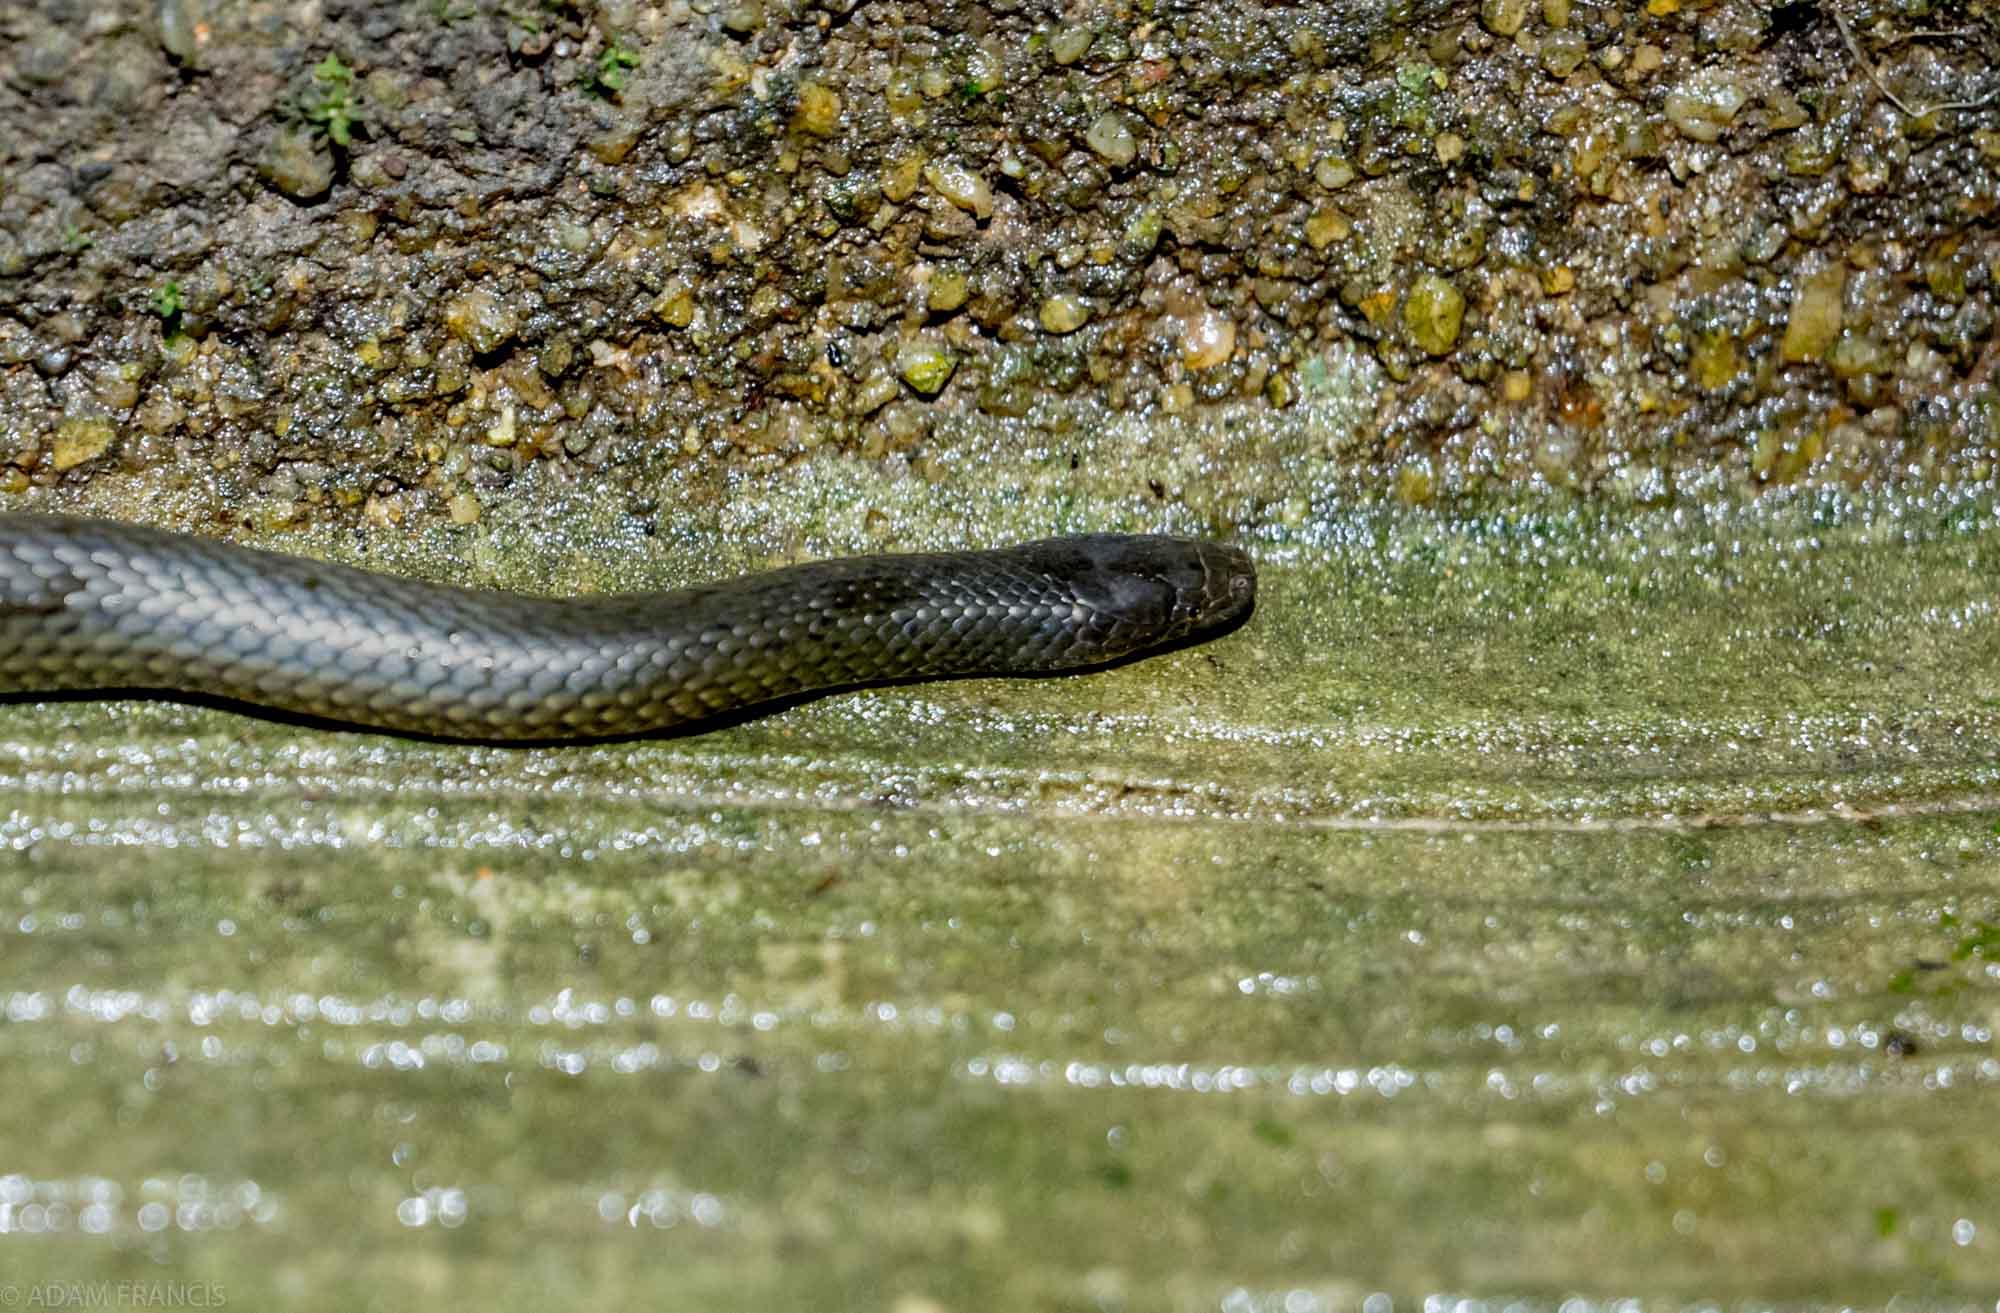 Copy of Anderson's Stream Snake